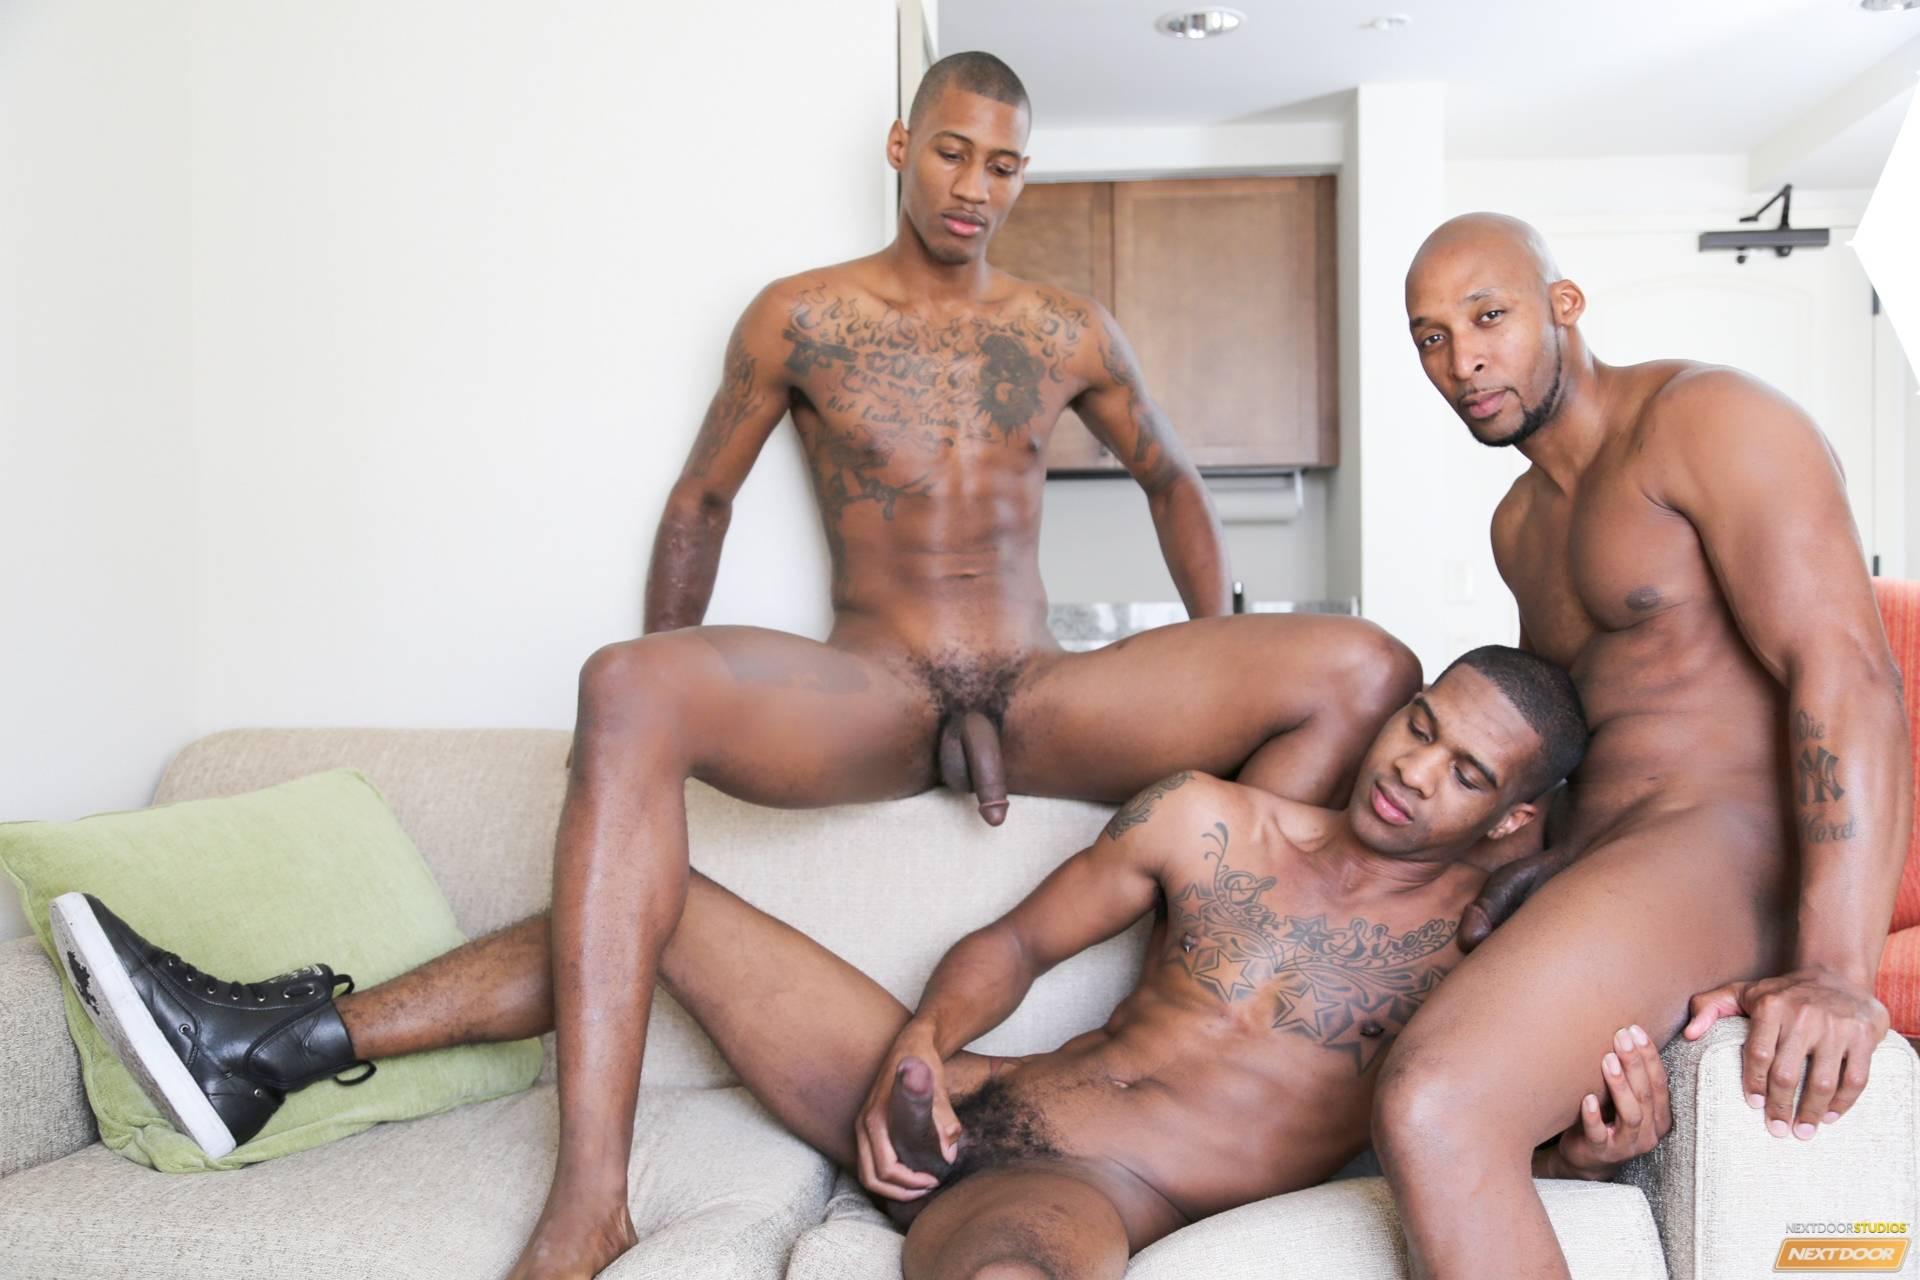 King fuck his slave woman cartoon photos naked video